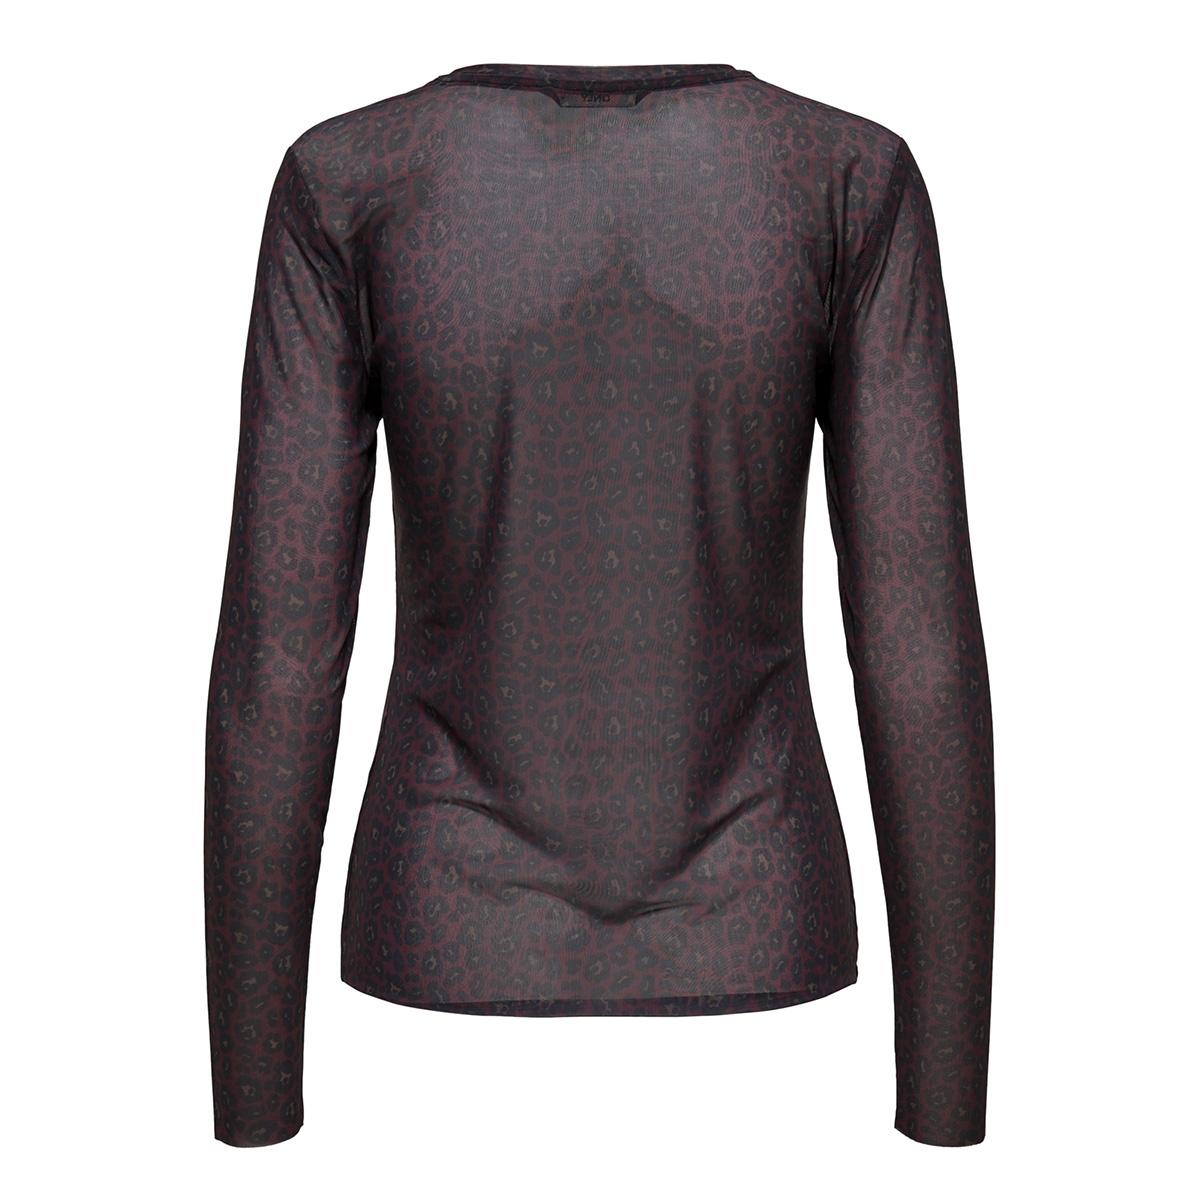 onlmaja leo mesh o-neck l/s top jrs 15161562 only t-shirt winetasting/red leo